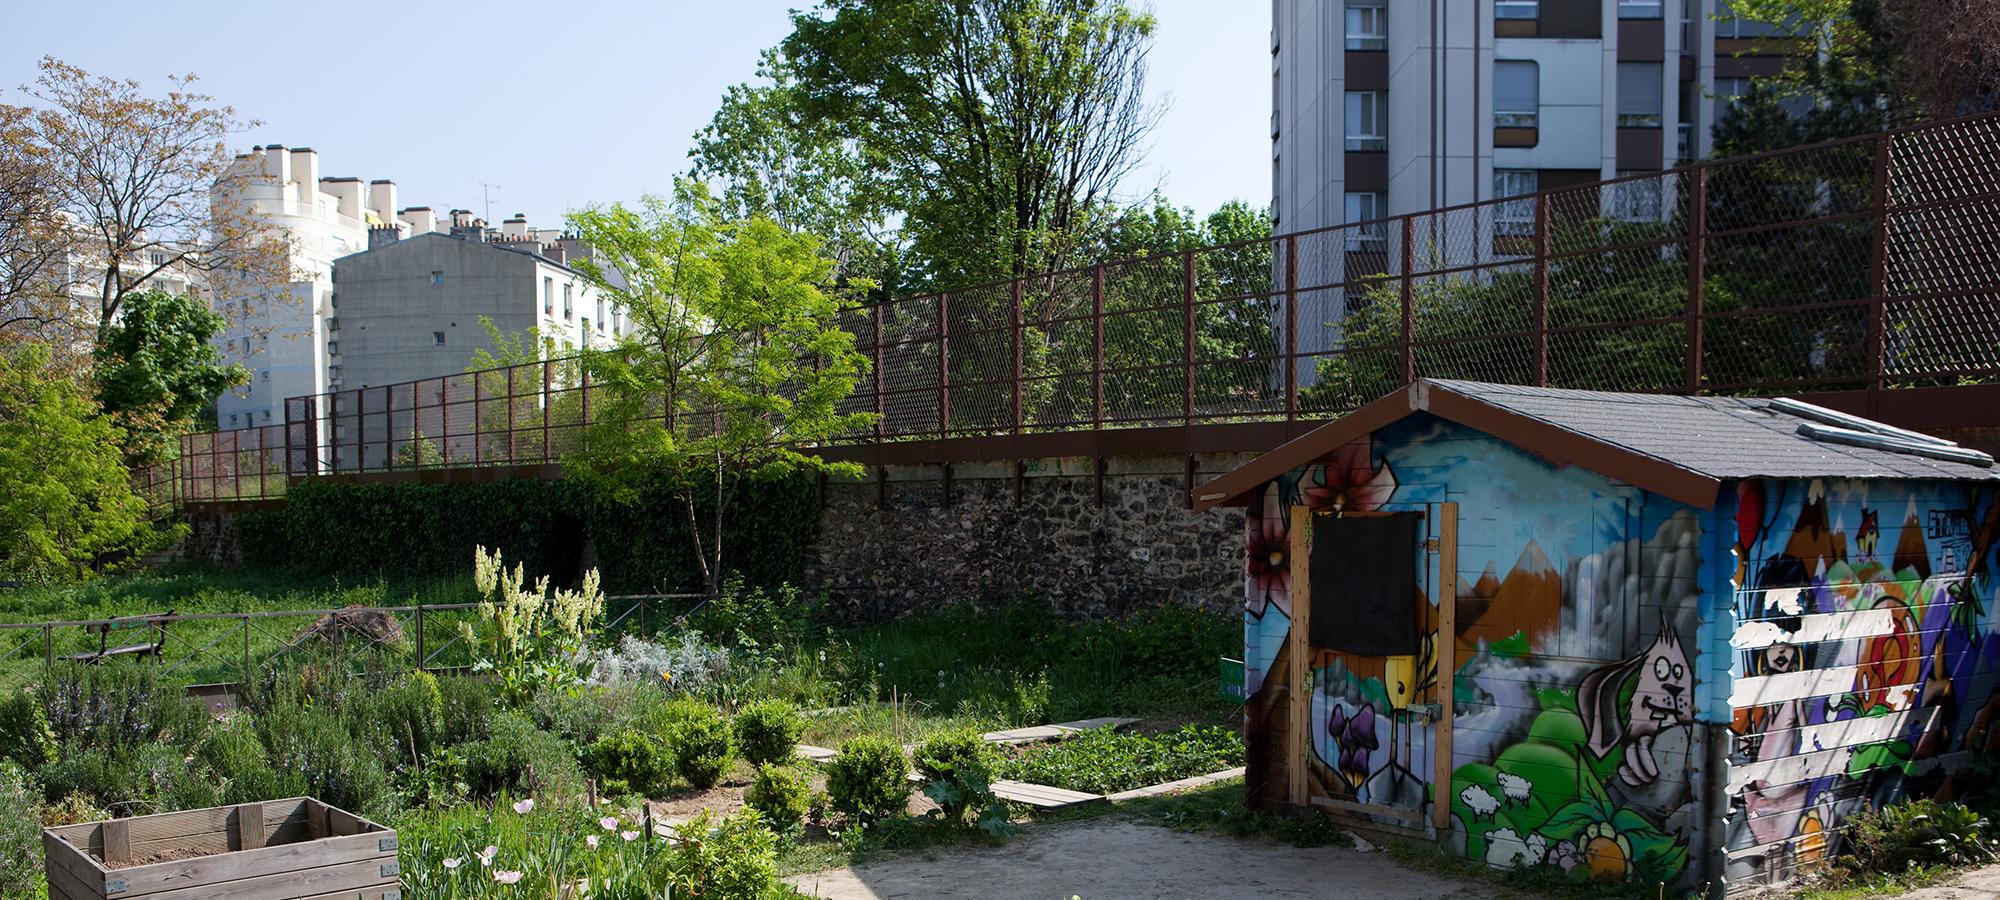 Community garden cropped